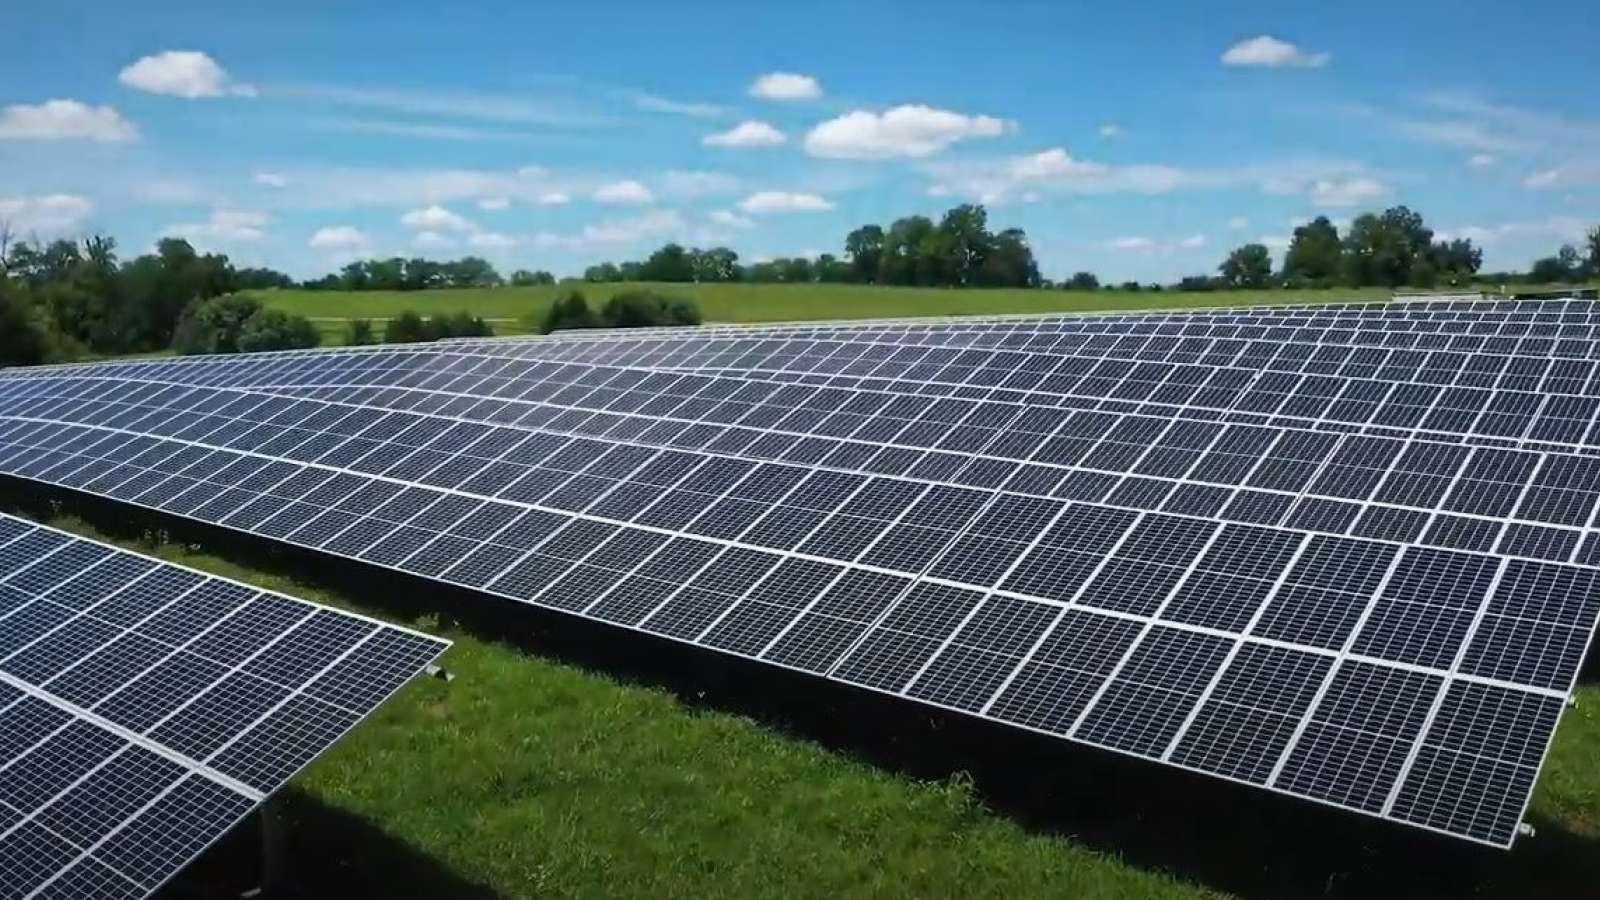 a field of solar arrays